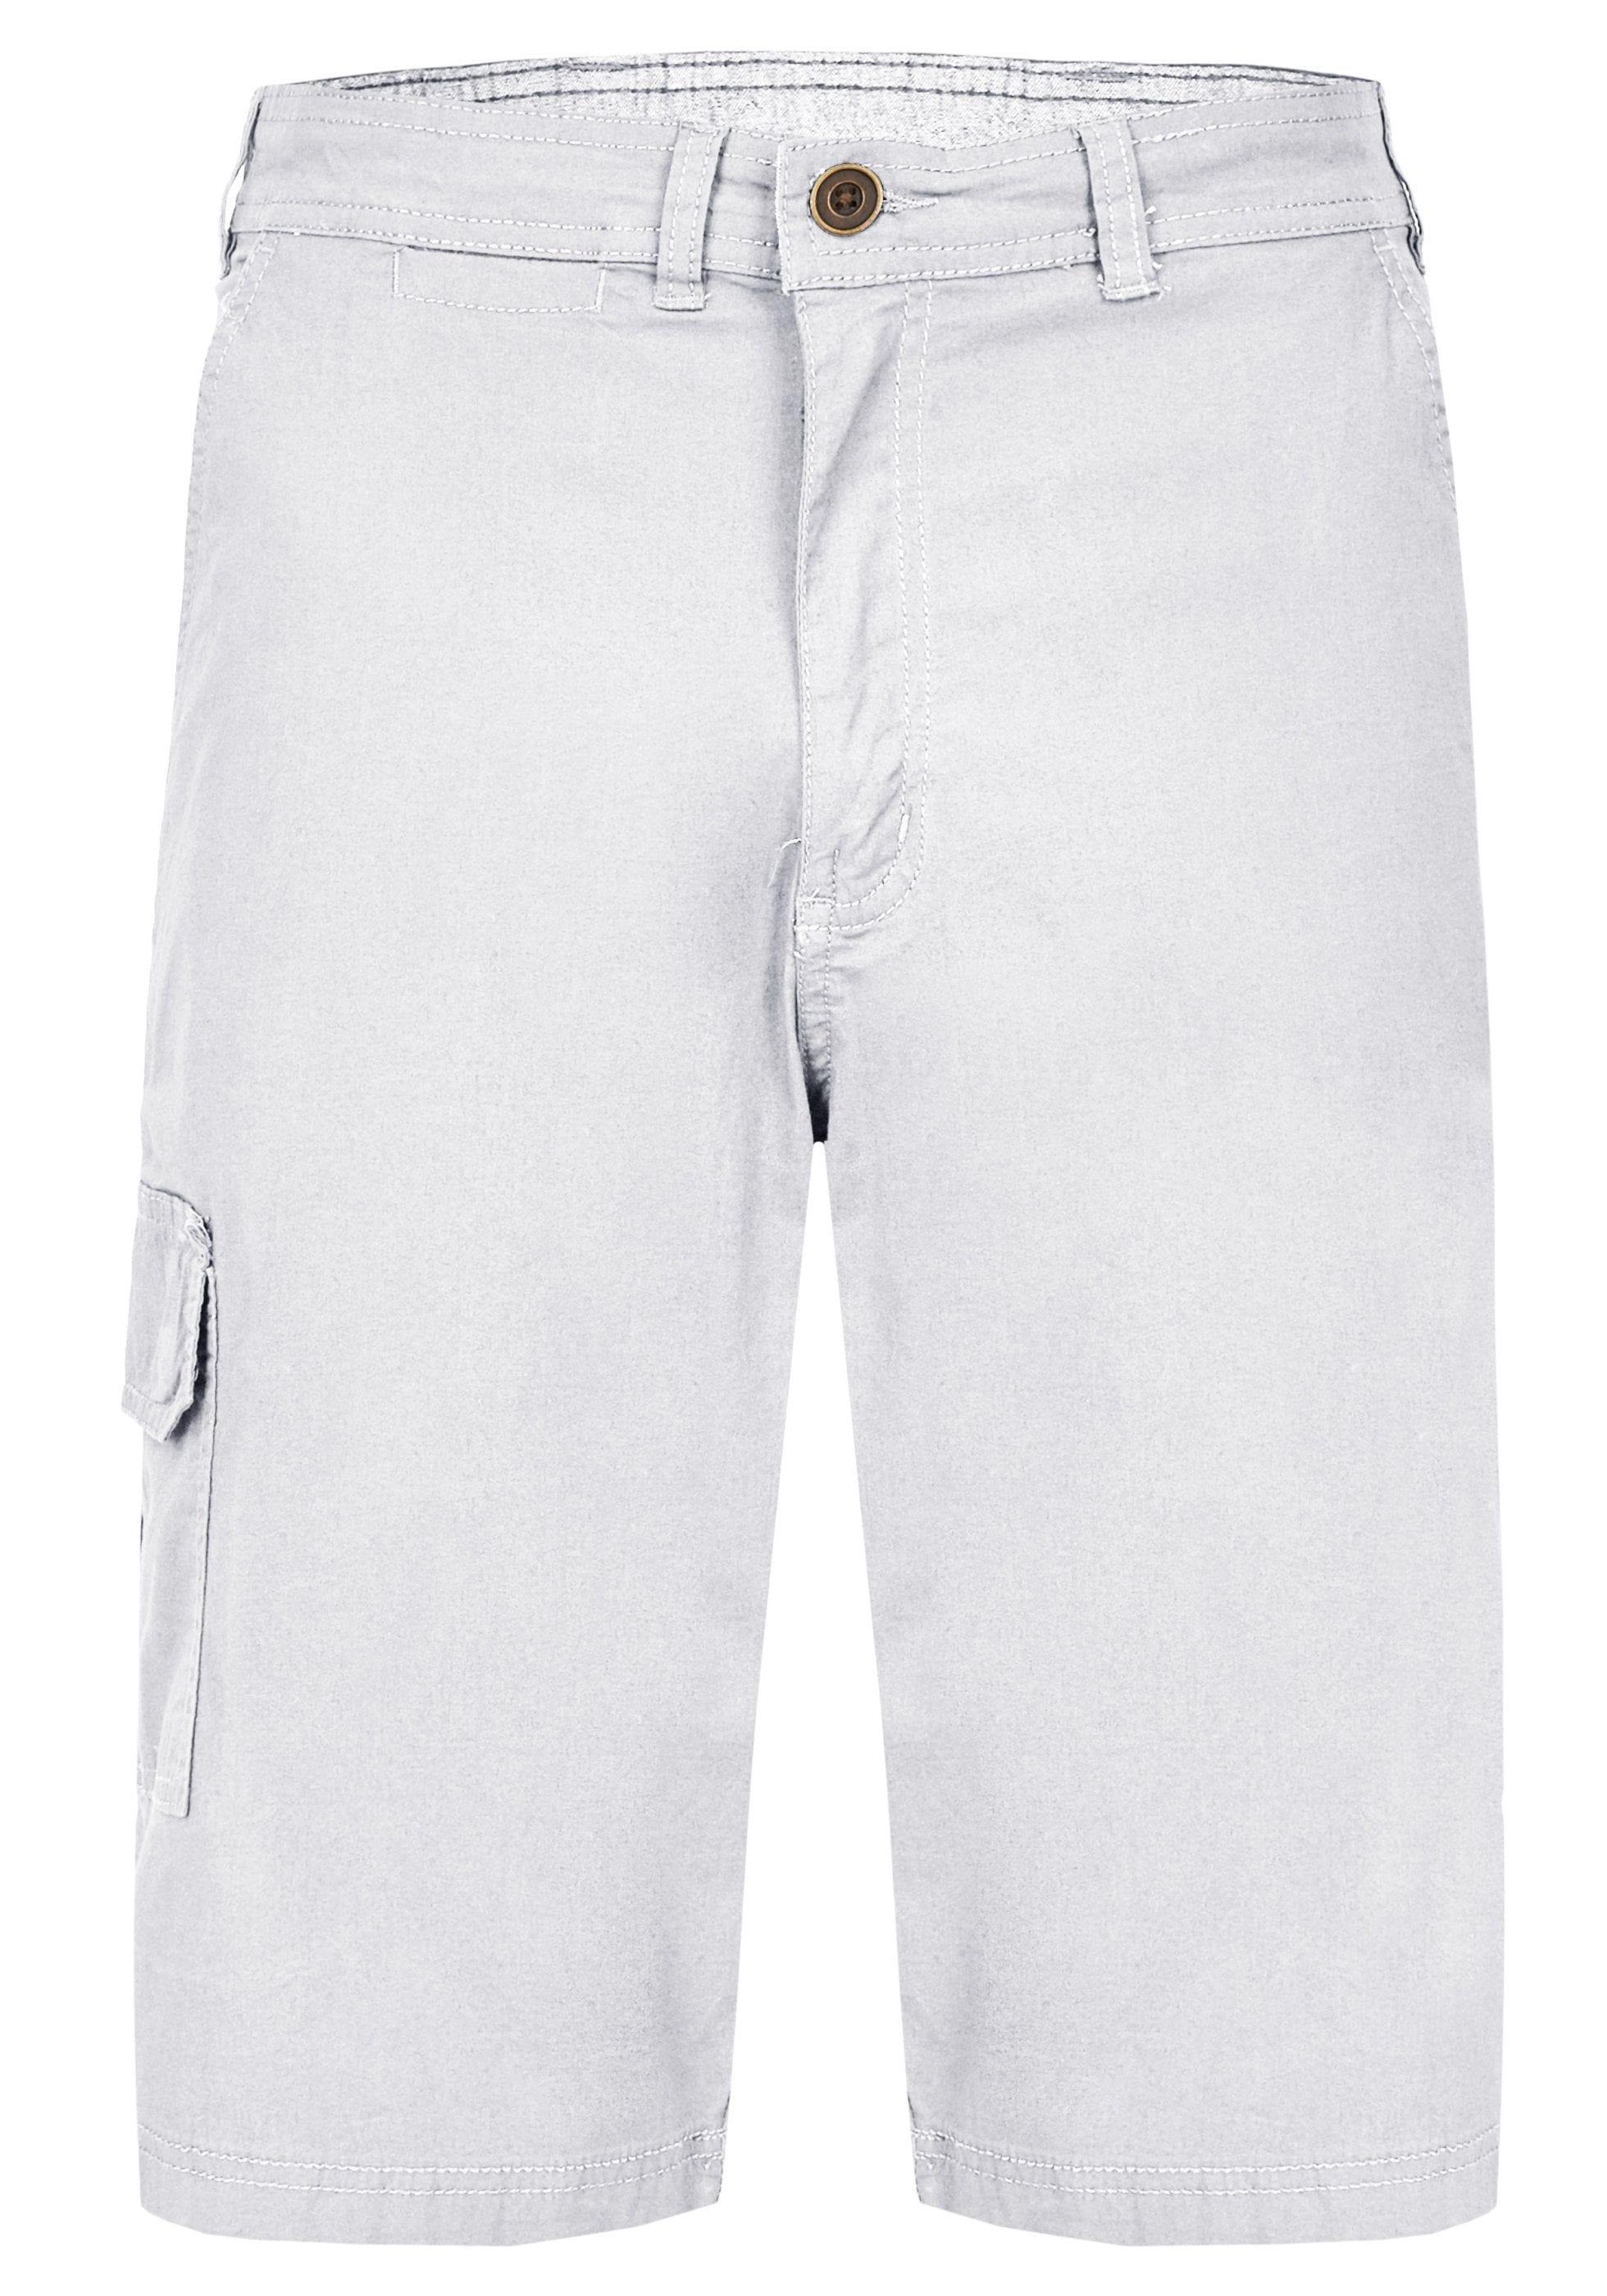 Hajo Bermuda | Bekleidung > Shorts & Bermudas > Bermudas | Weiß | Elasthan | Hajo